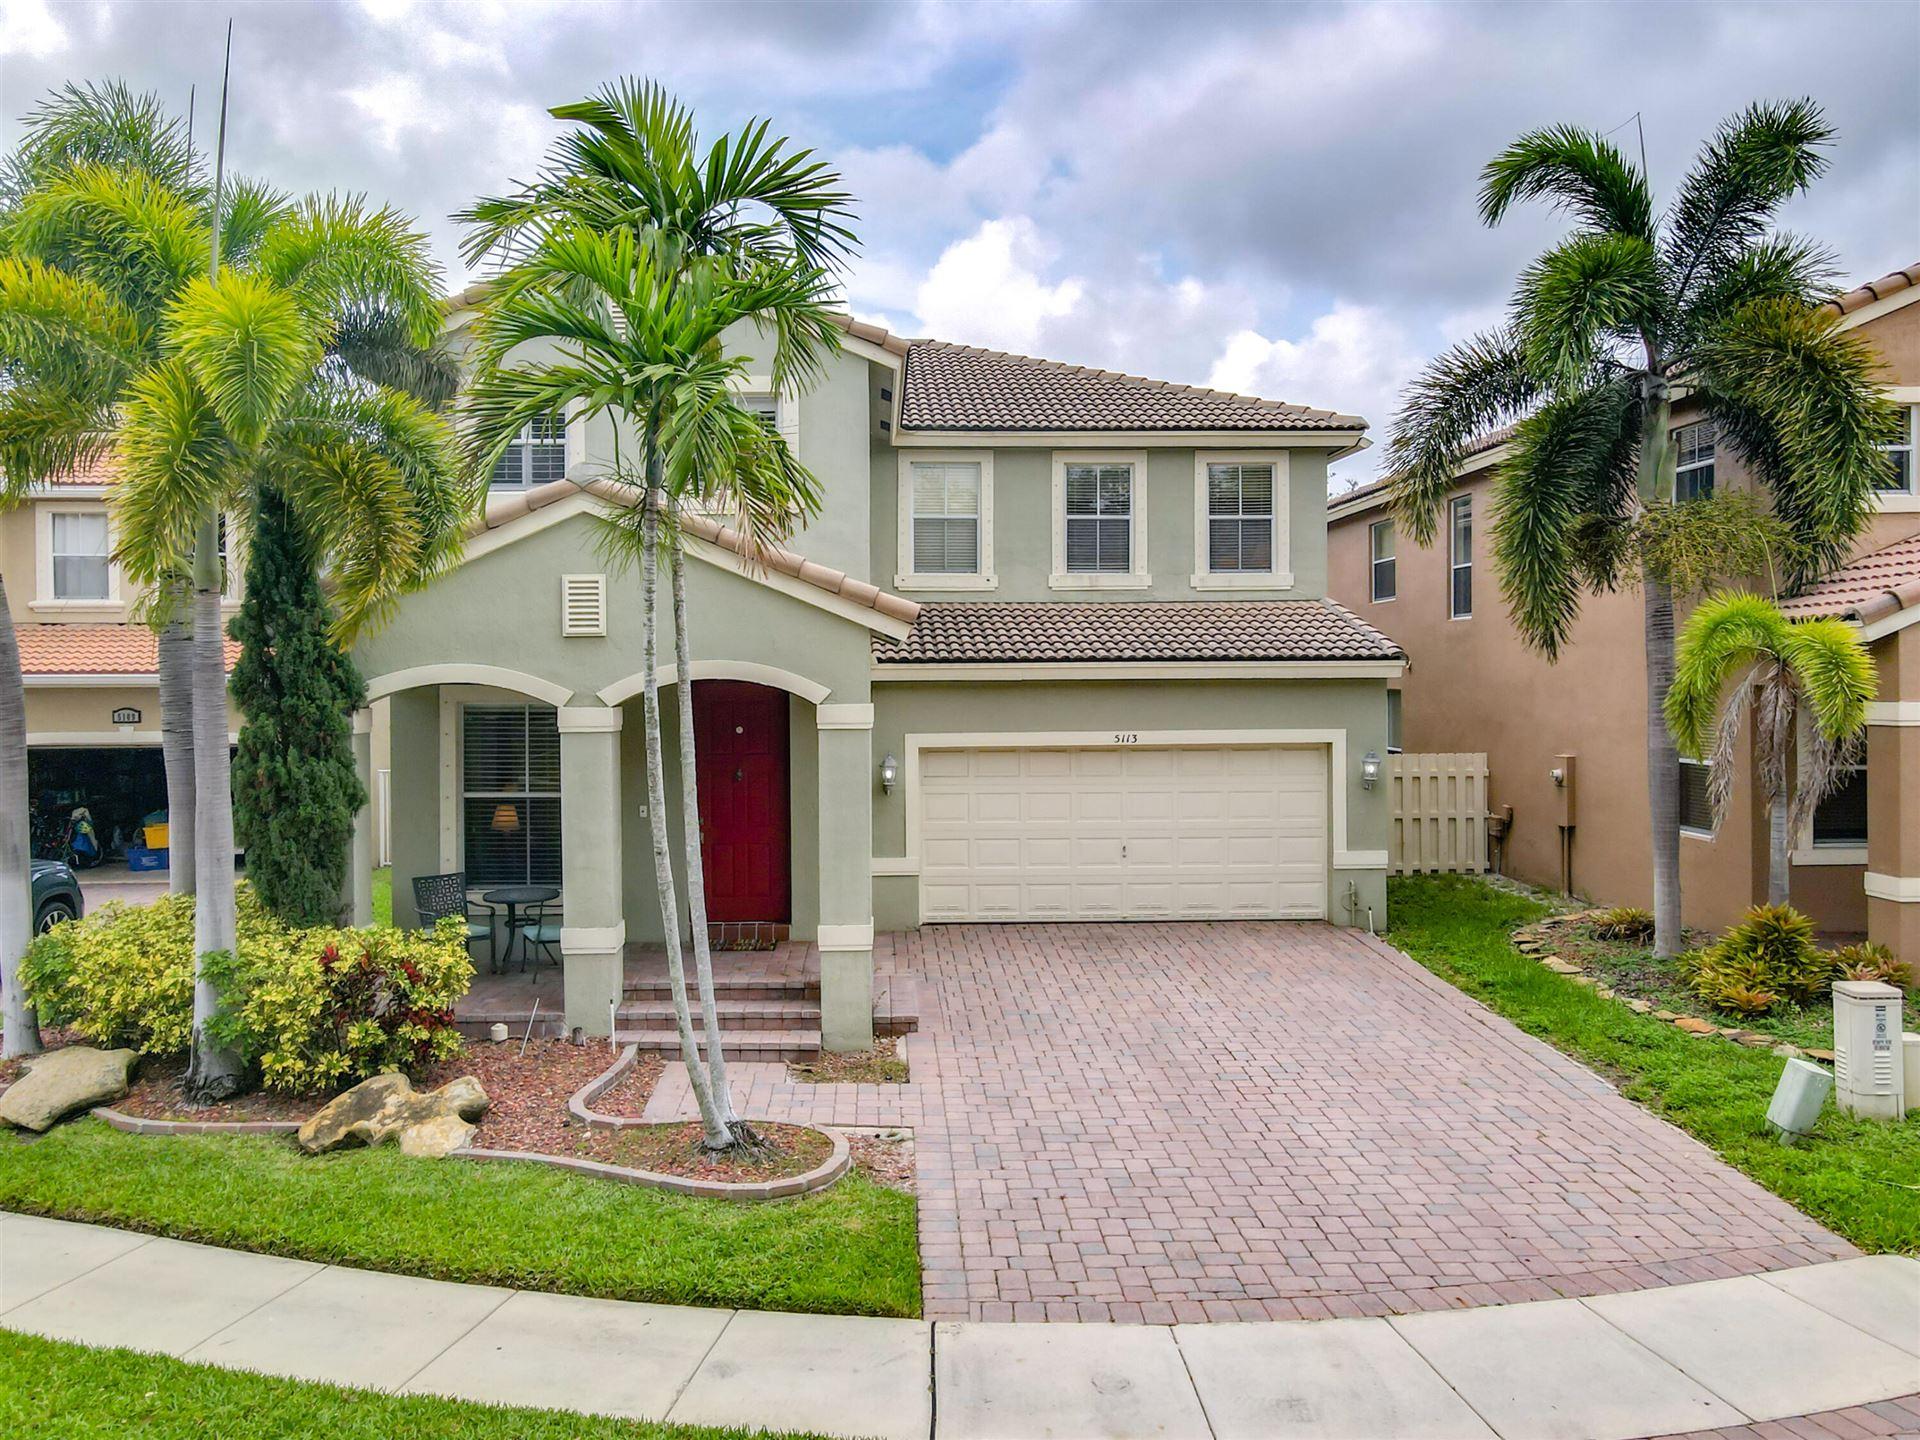 5113 Sancerre Circle, Lake Worth, FL 33463 - MLS#: RX-10731467